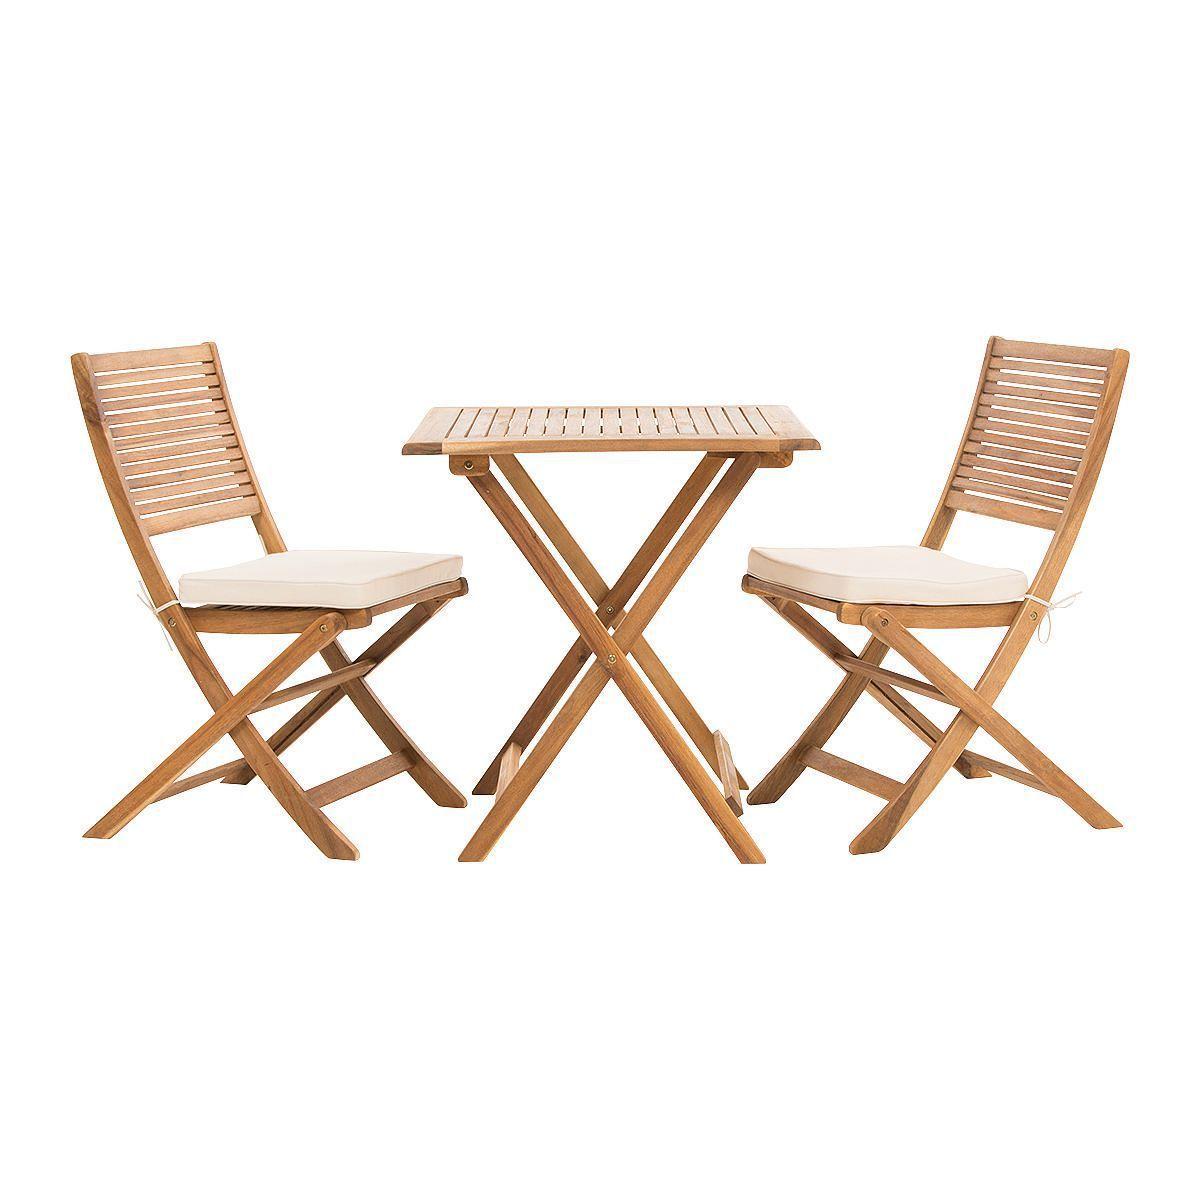 Gartenmöbel Set Angebote – ElvenBride.com